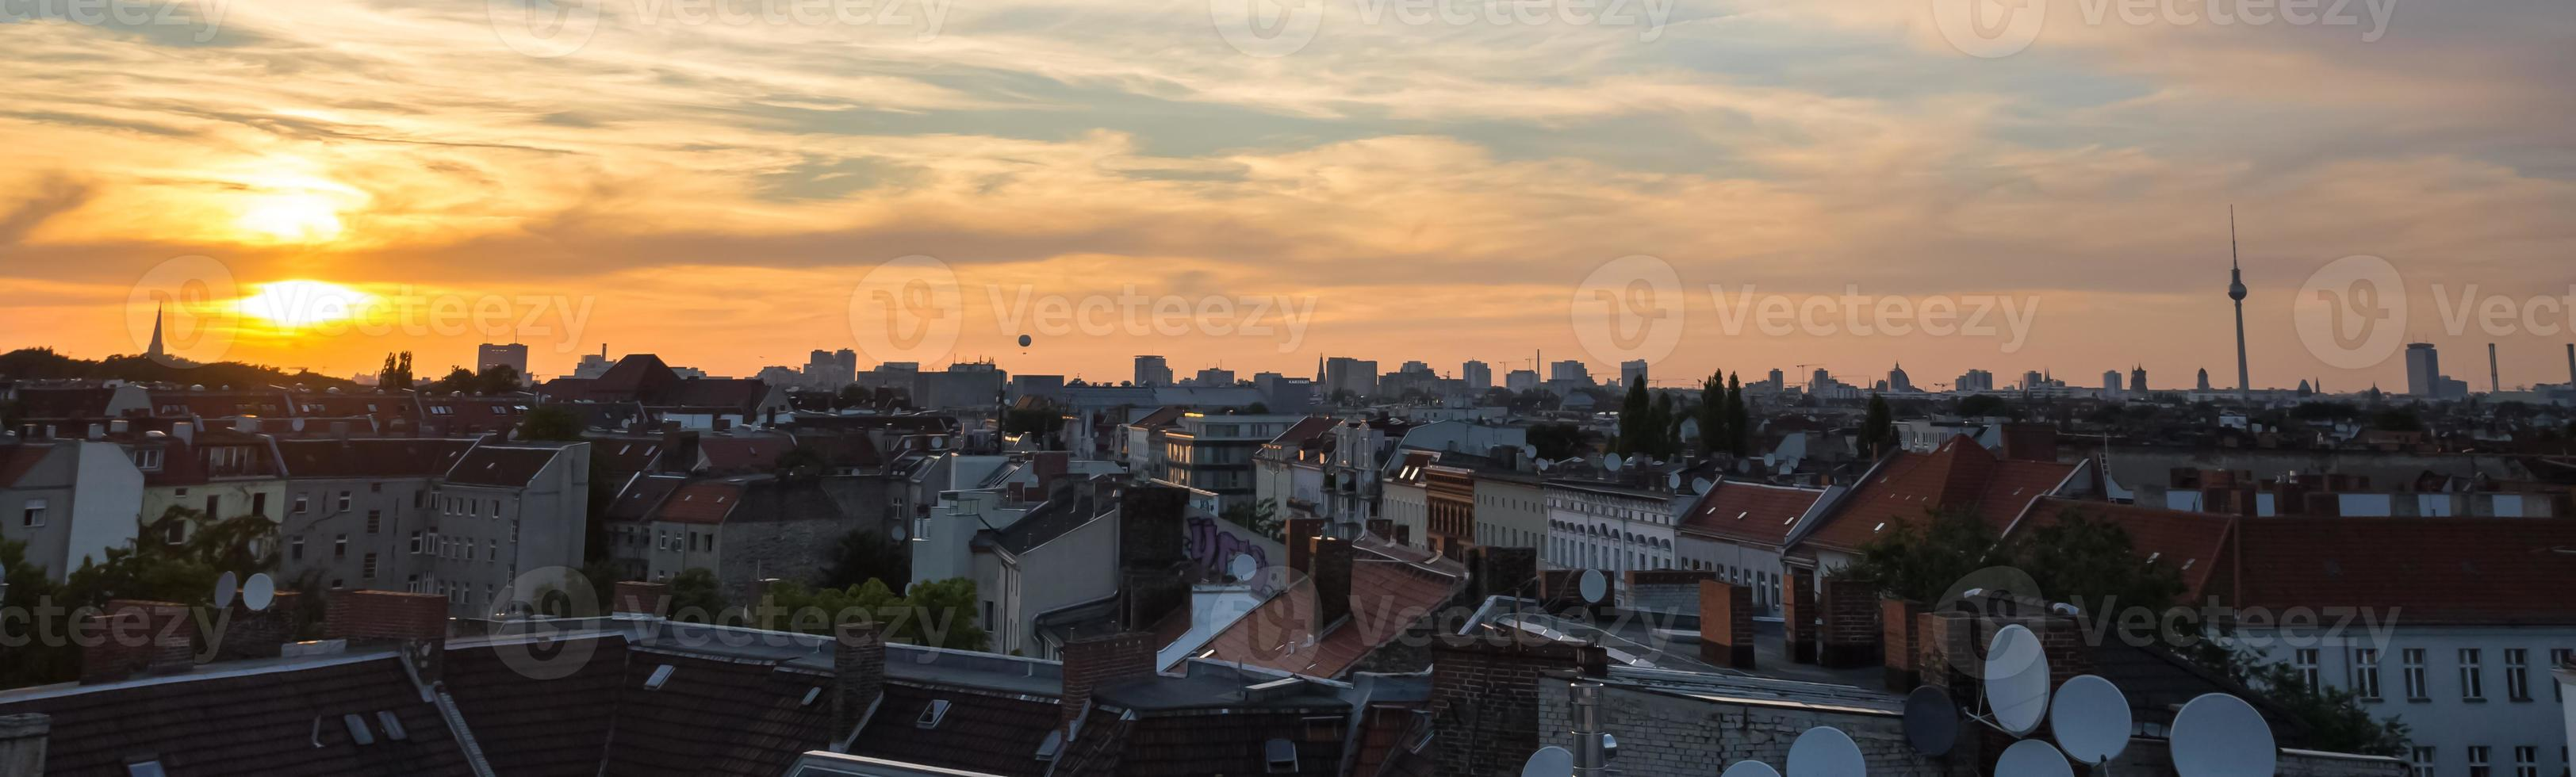 berlin cityscape sundown photo